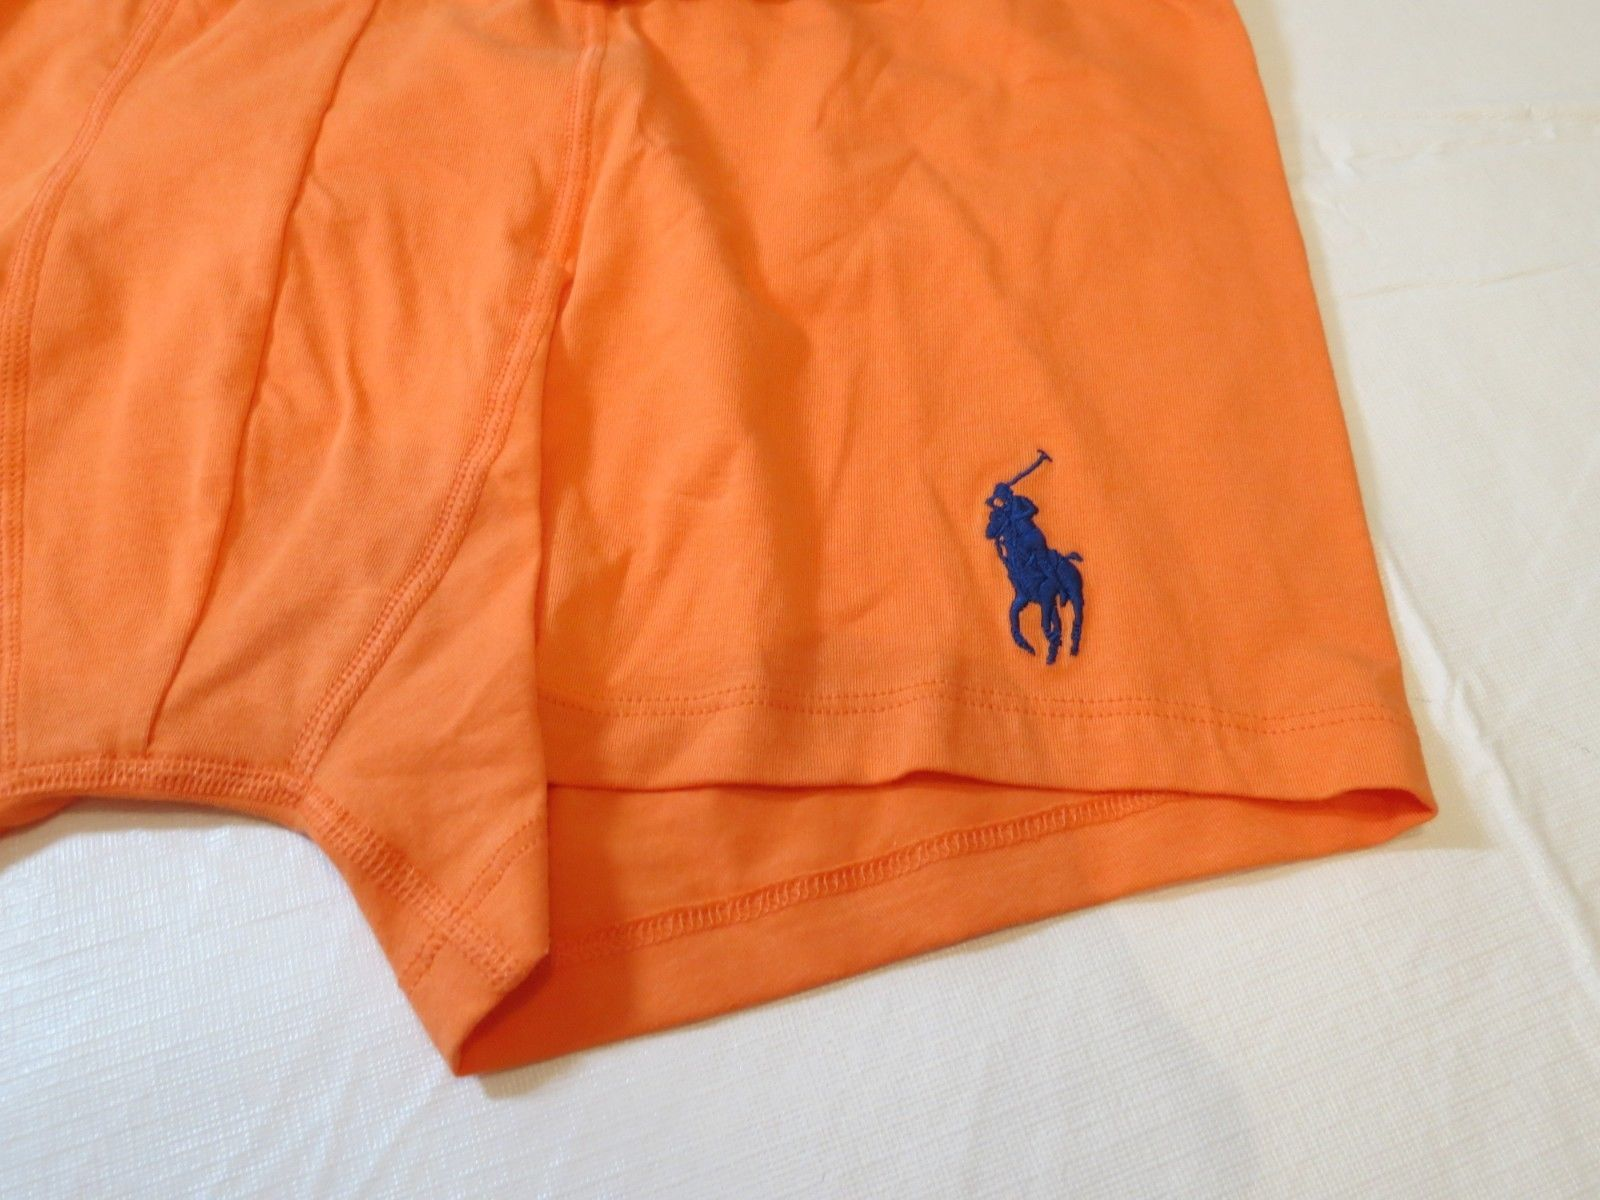 Polo Ralph Lauren underwear men's Boxer Brief Traditional Leg length XL xlg JMH